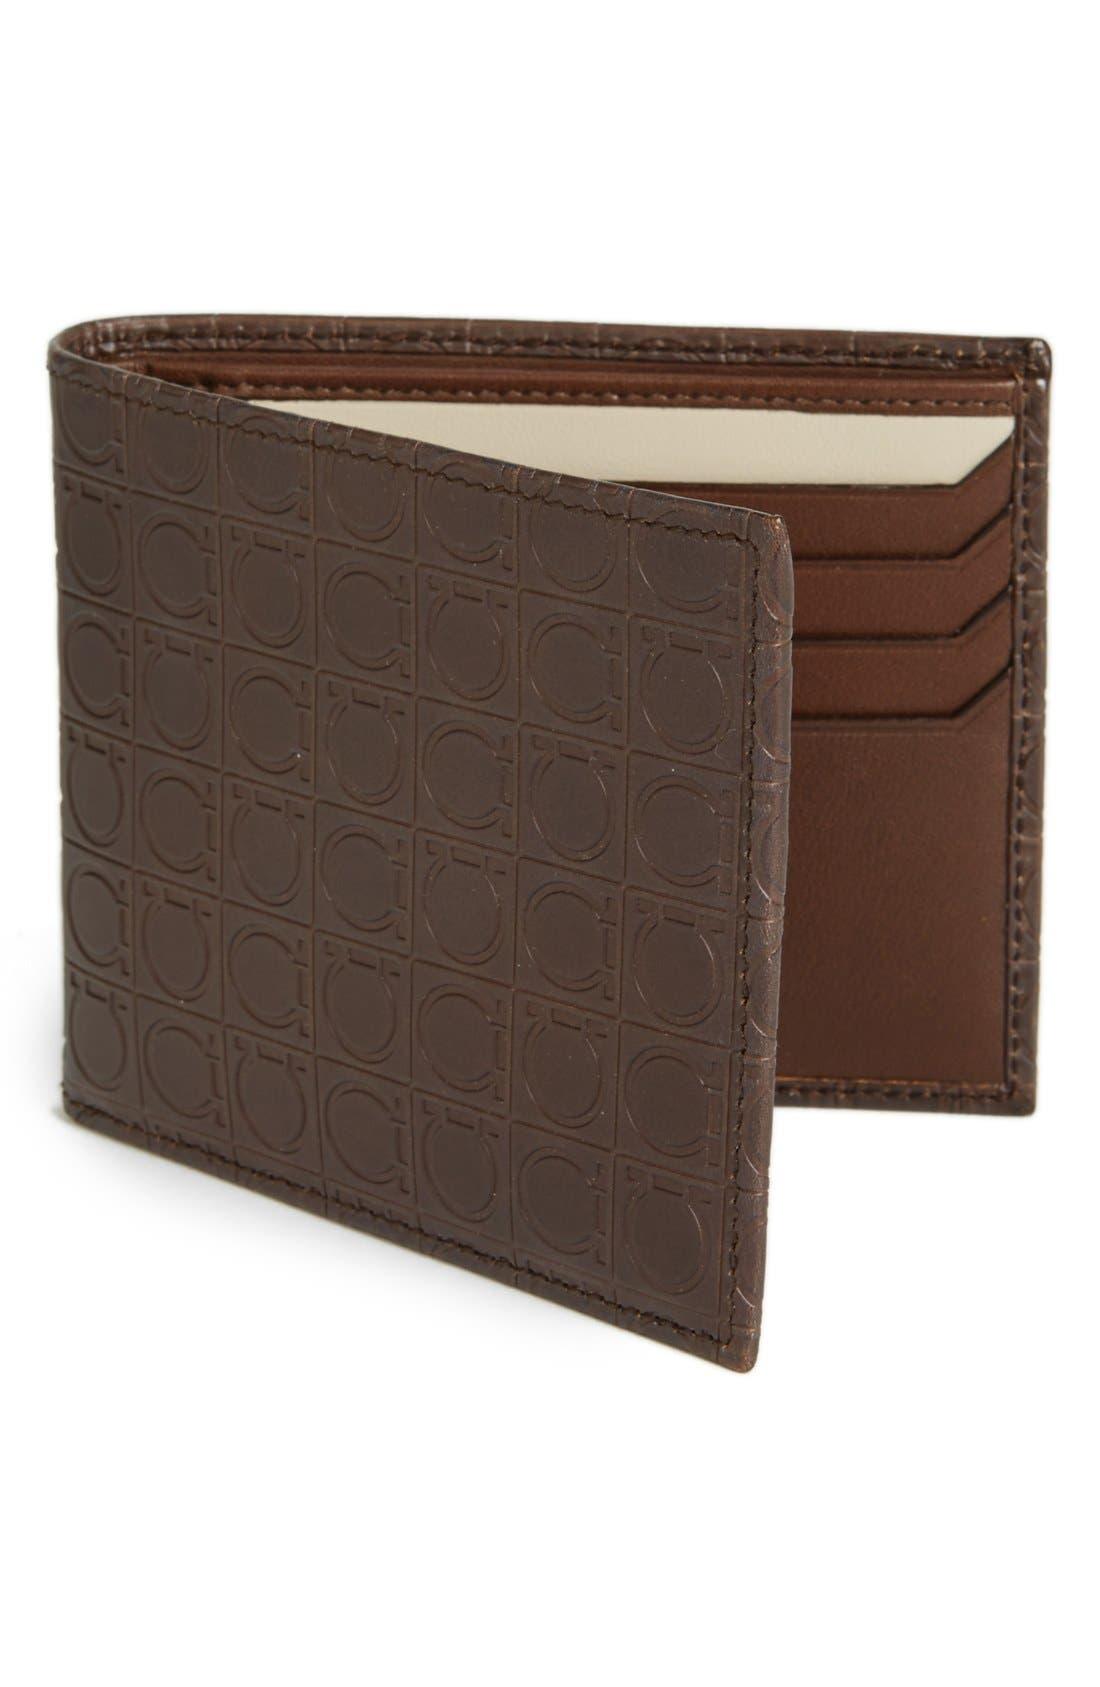 Main Image - Salvatore Ferragamo Leather Wallet